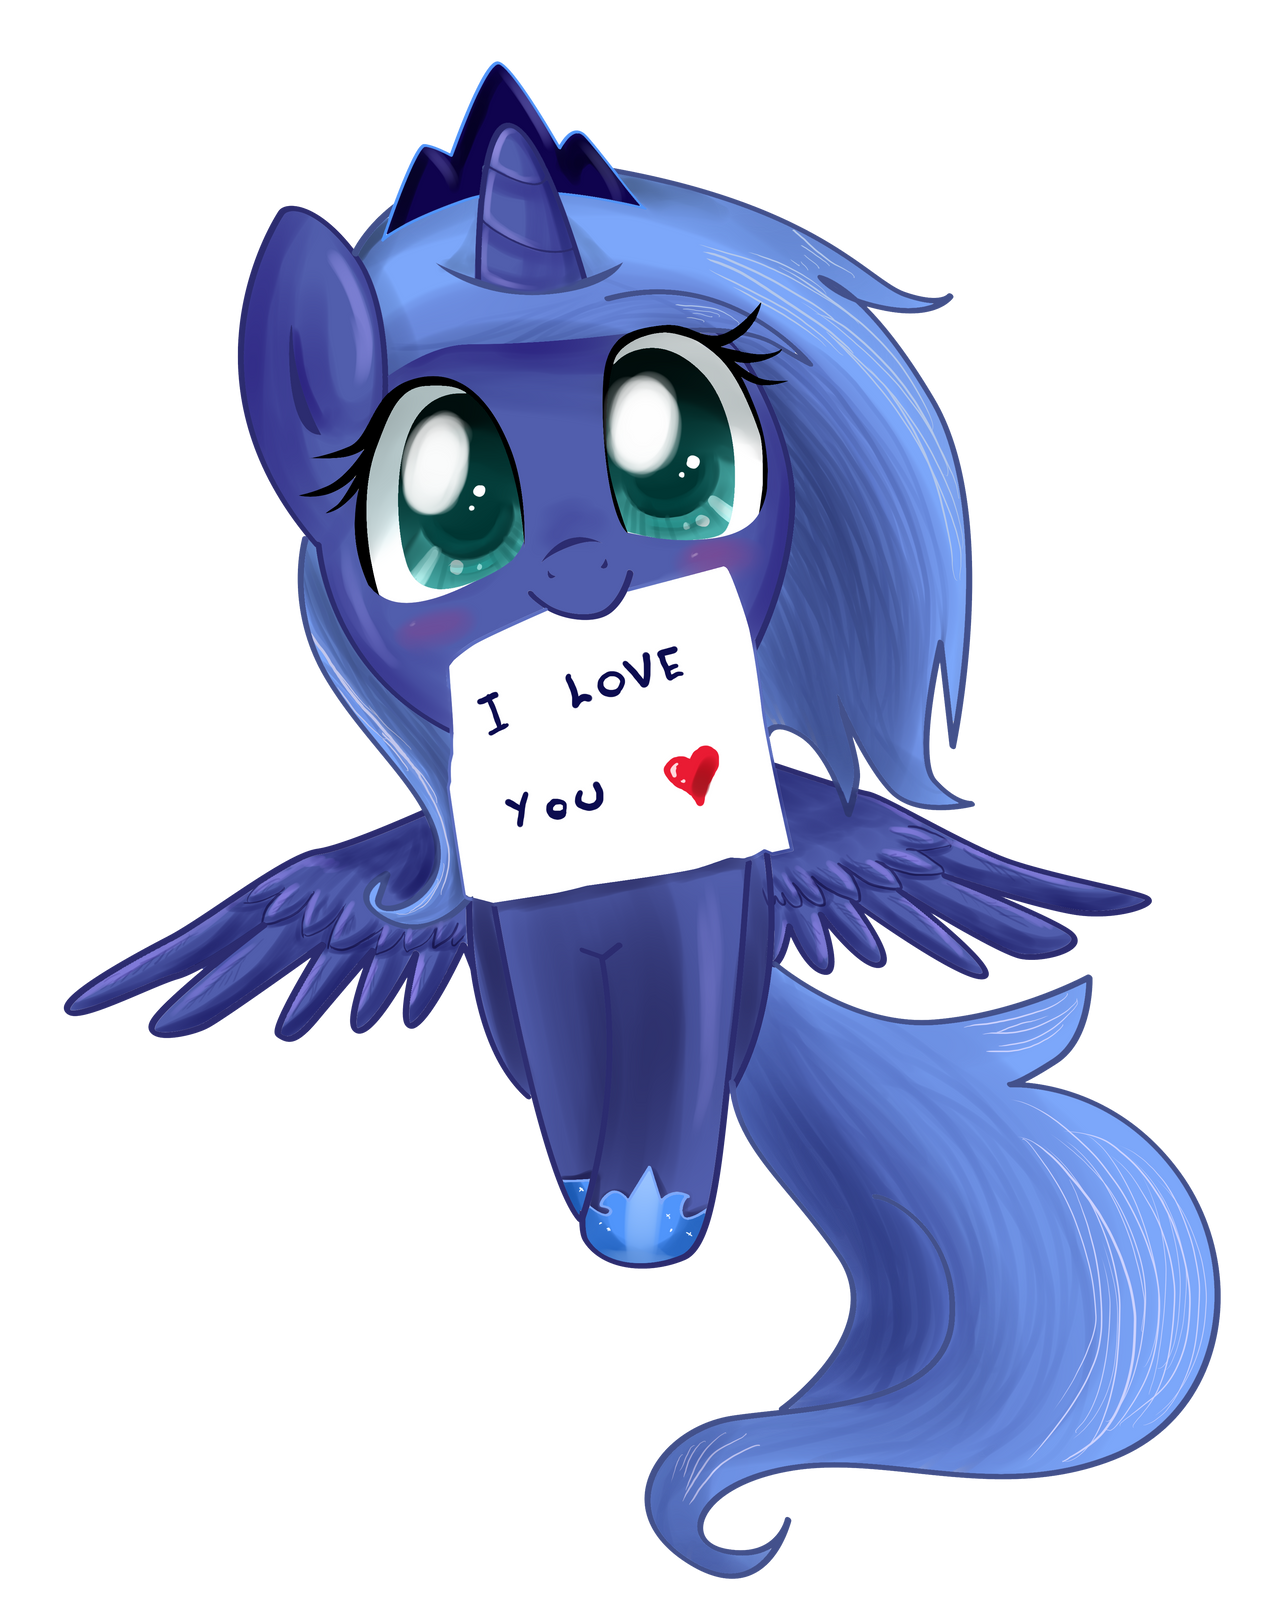 I love you by pridark